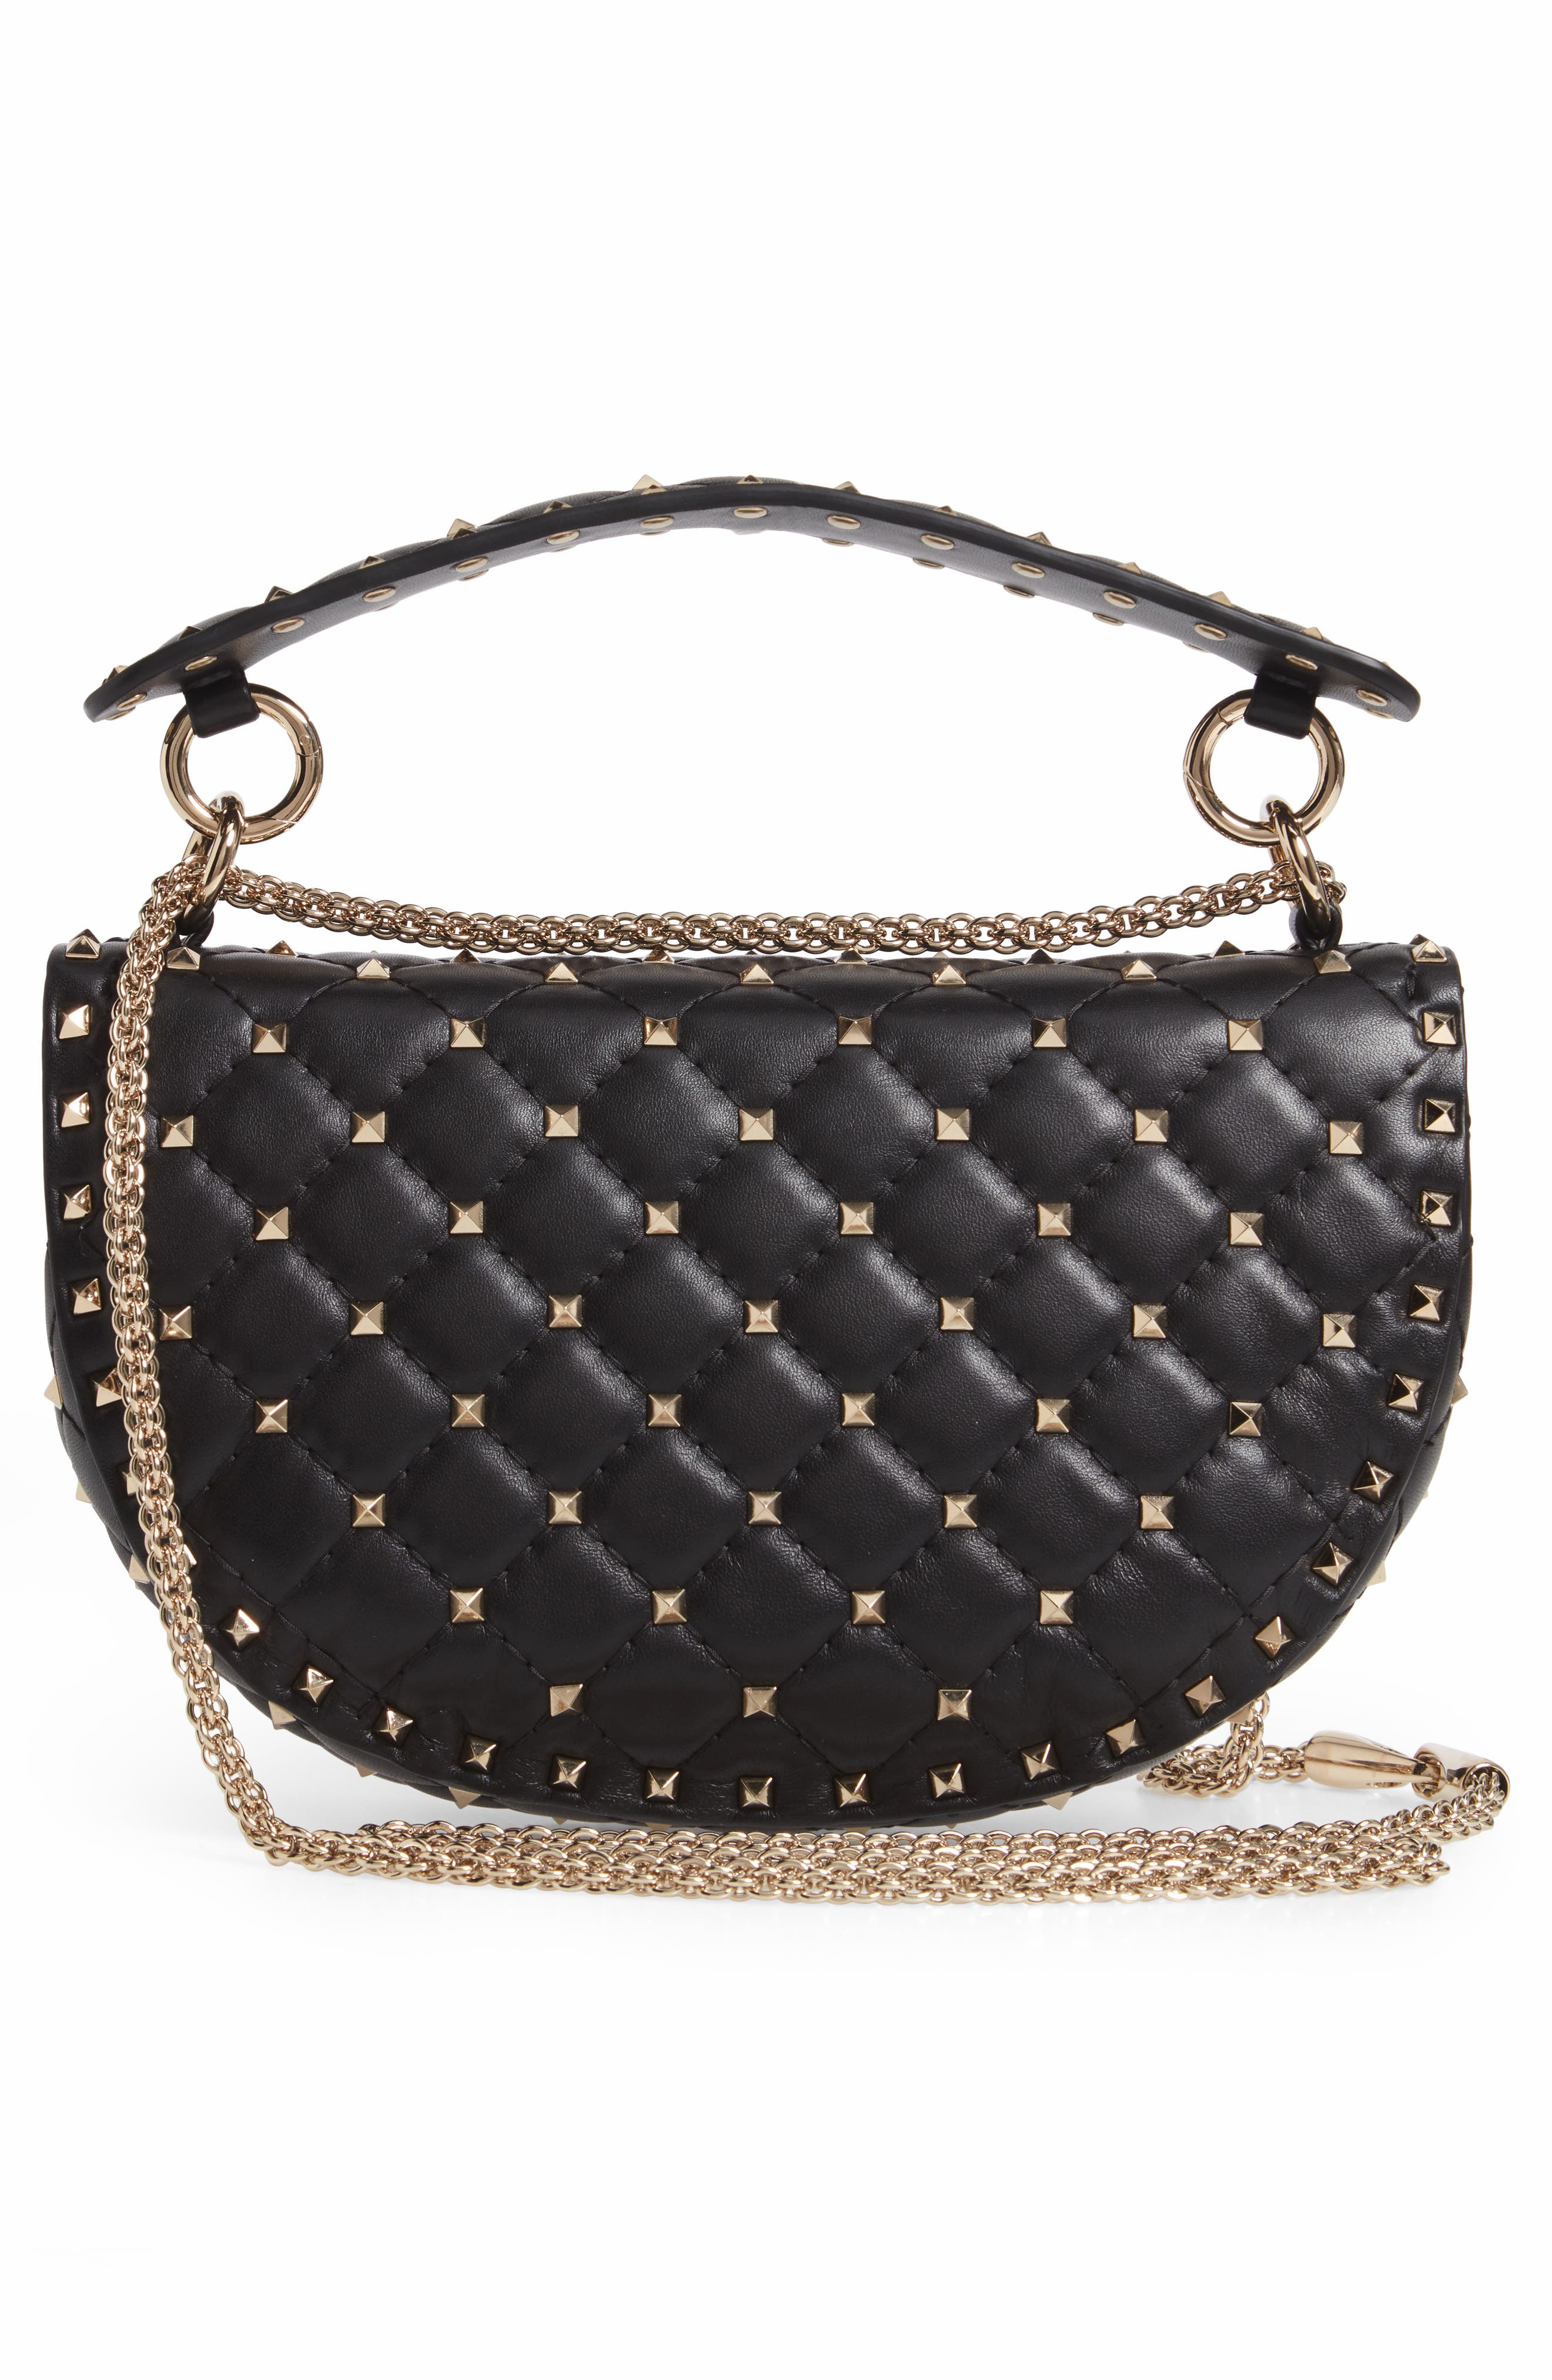 VALENTINO GARAVANI, Rockstud Spike Leather Saddle Bag, Alternate thumbnail 3, color, NERO